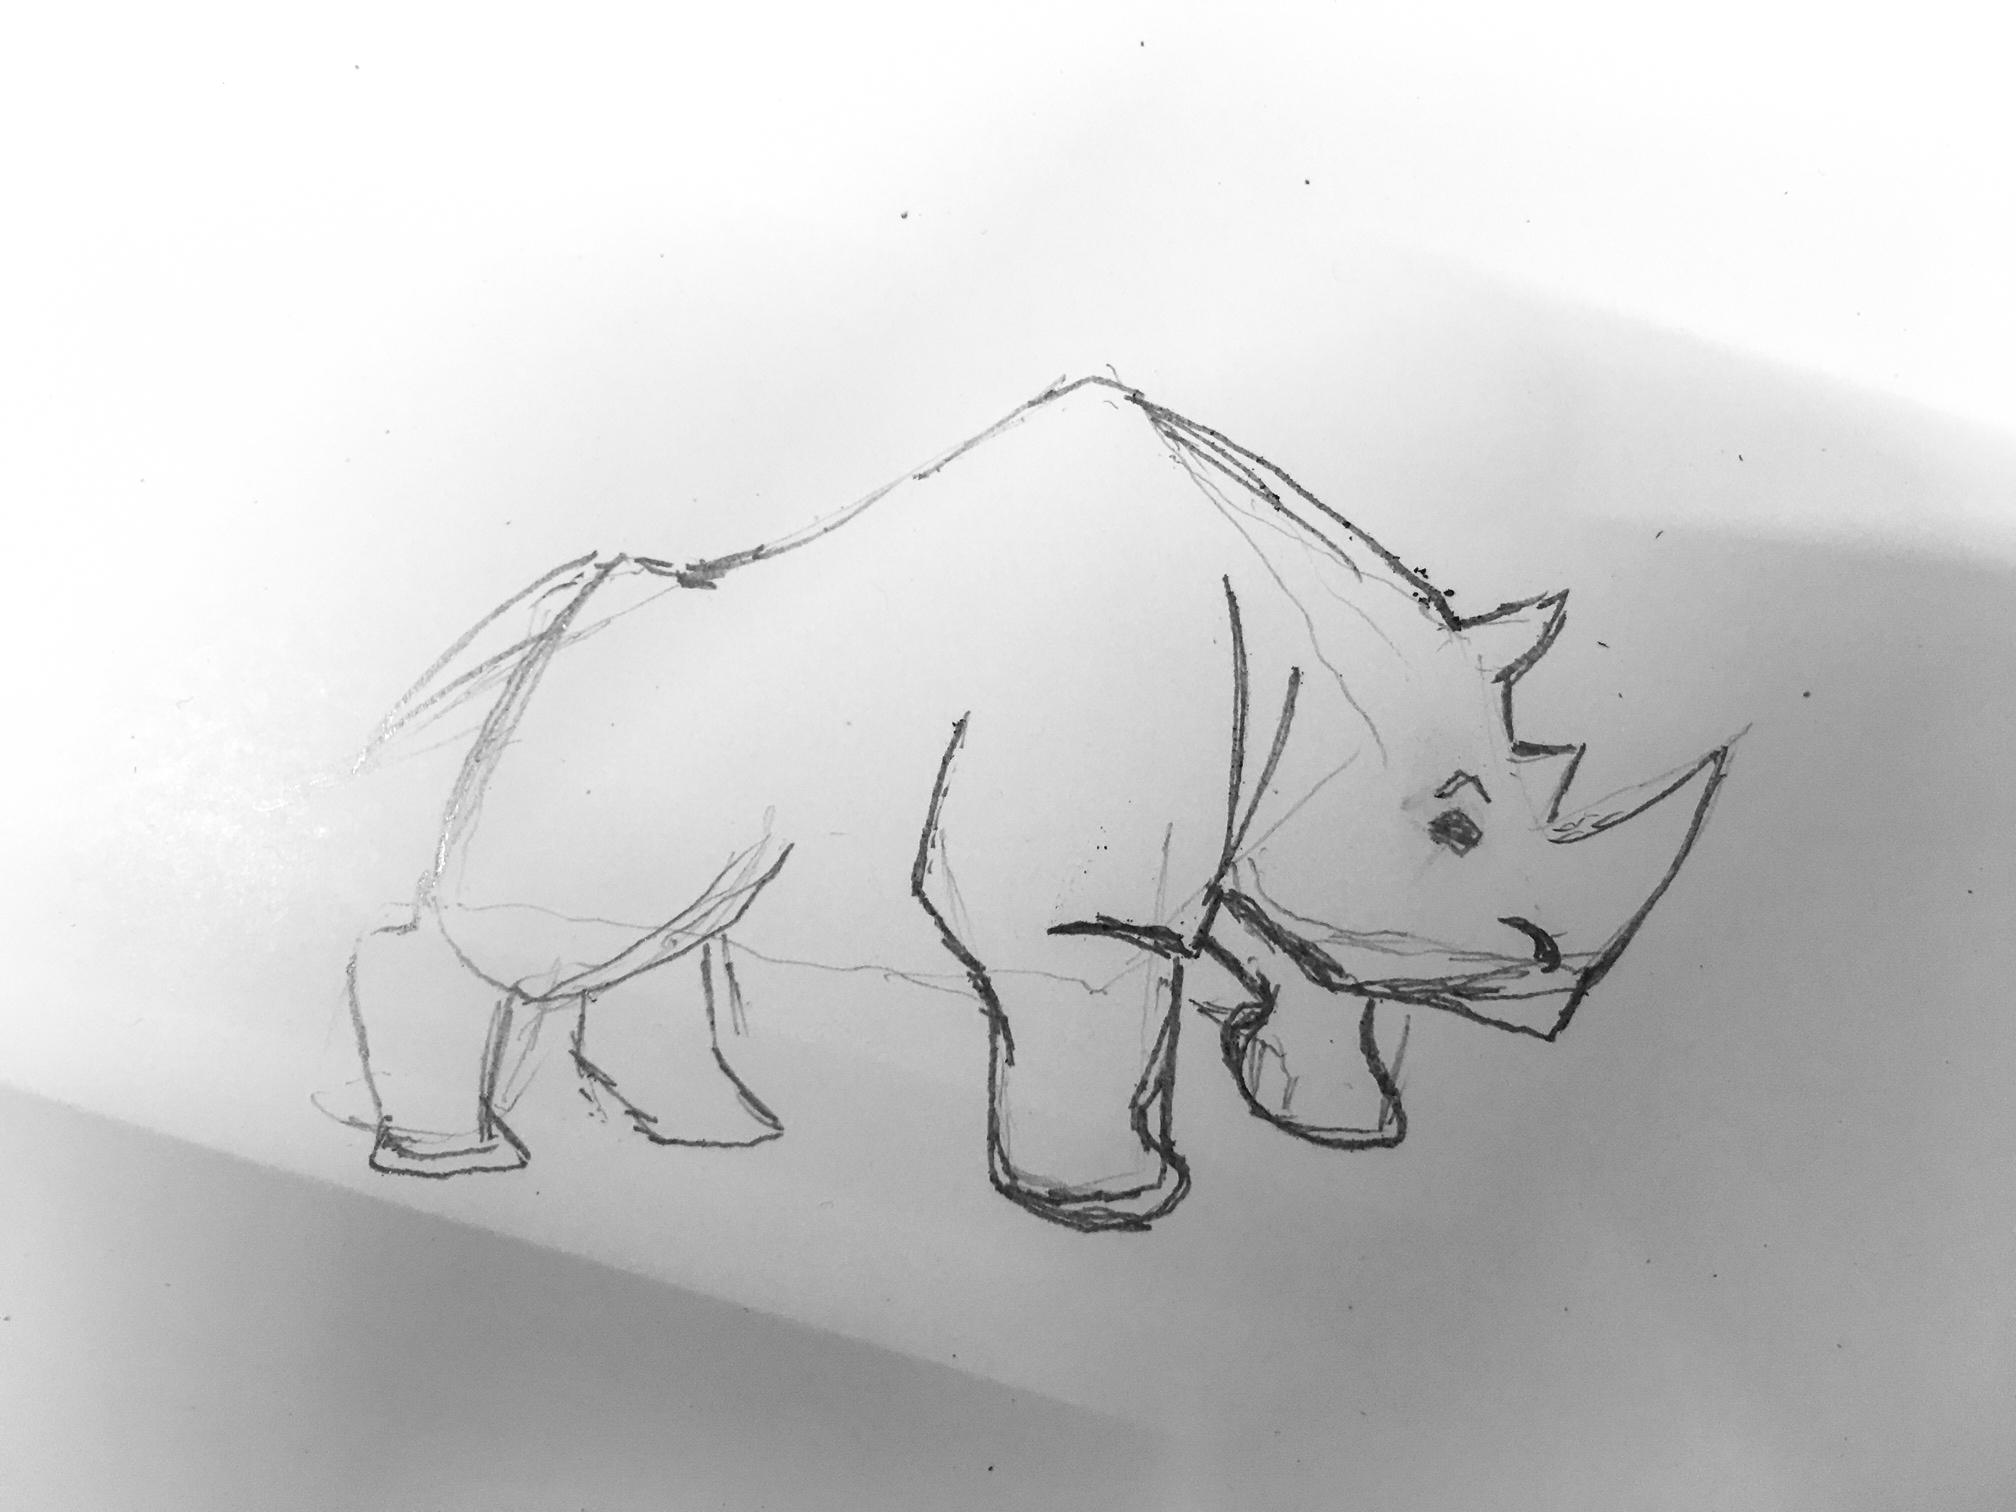 rhino-1.jpg